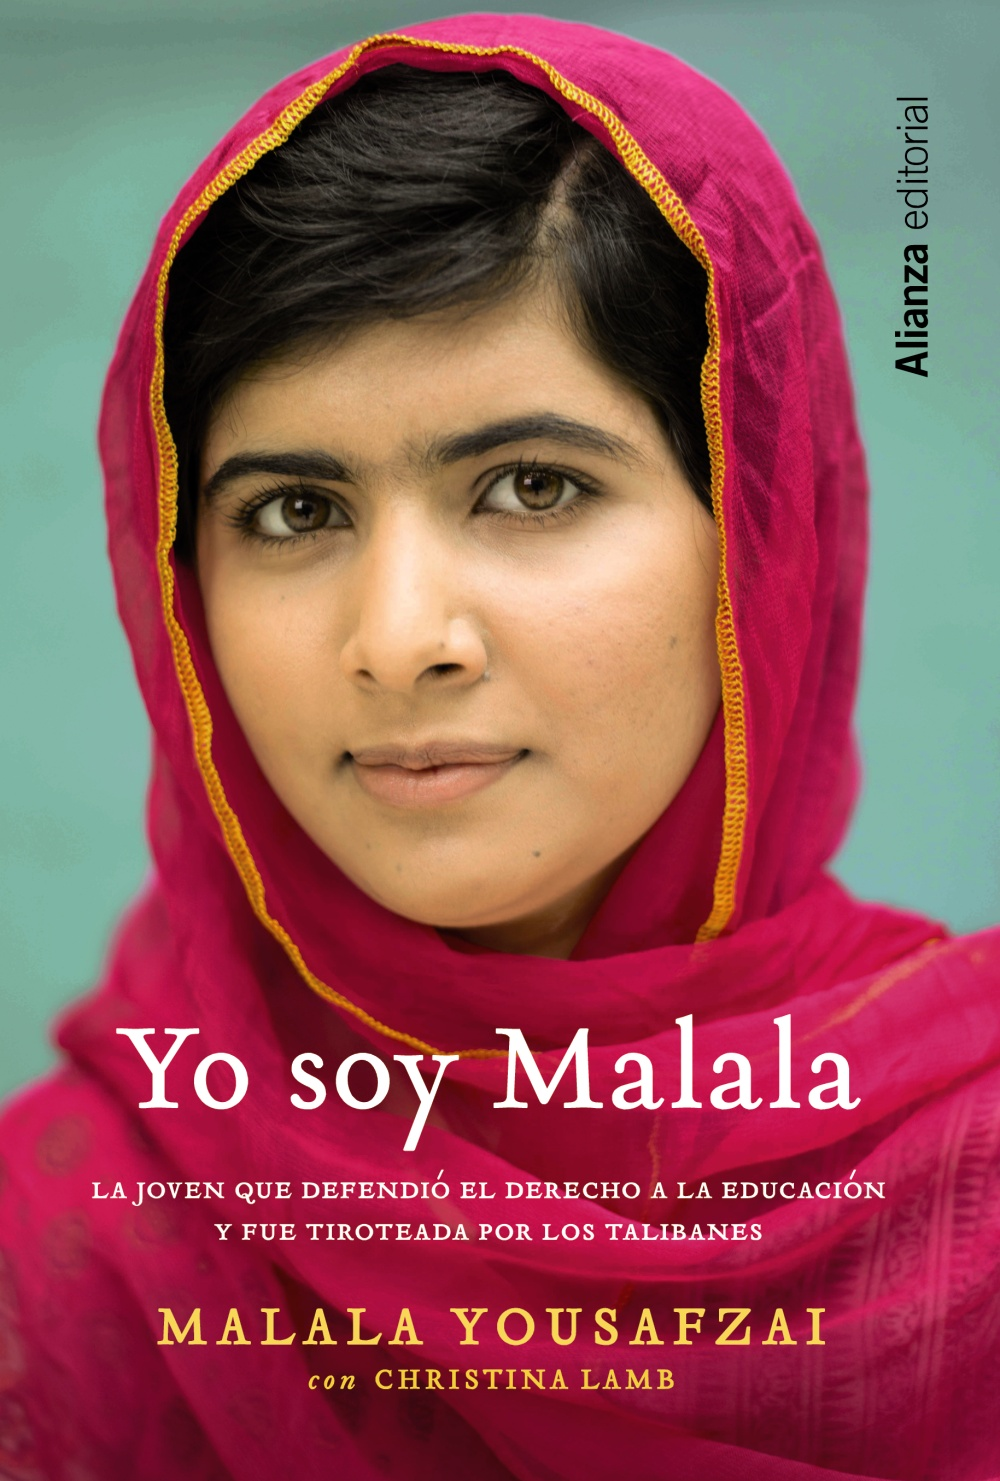 Reseña: Yo soy Malala - Malala Yousafzai